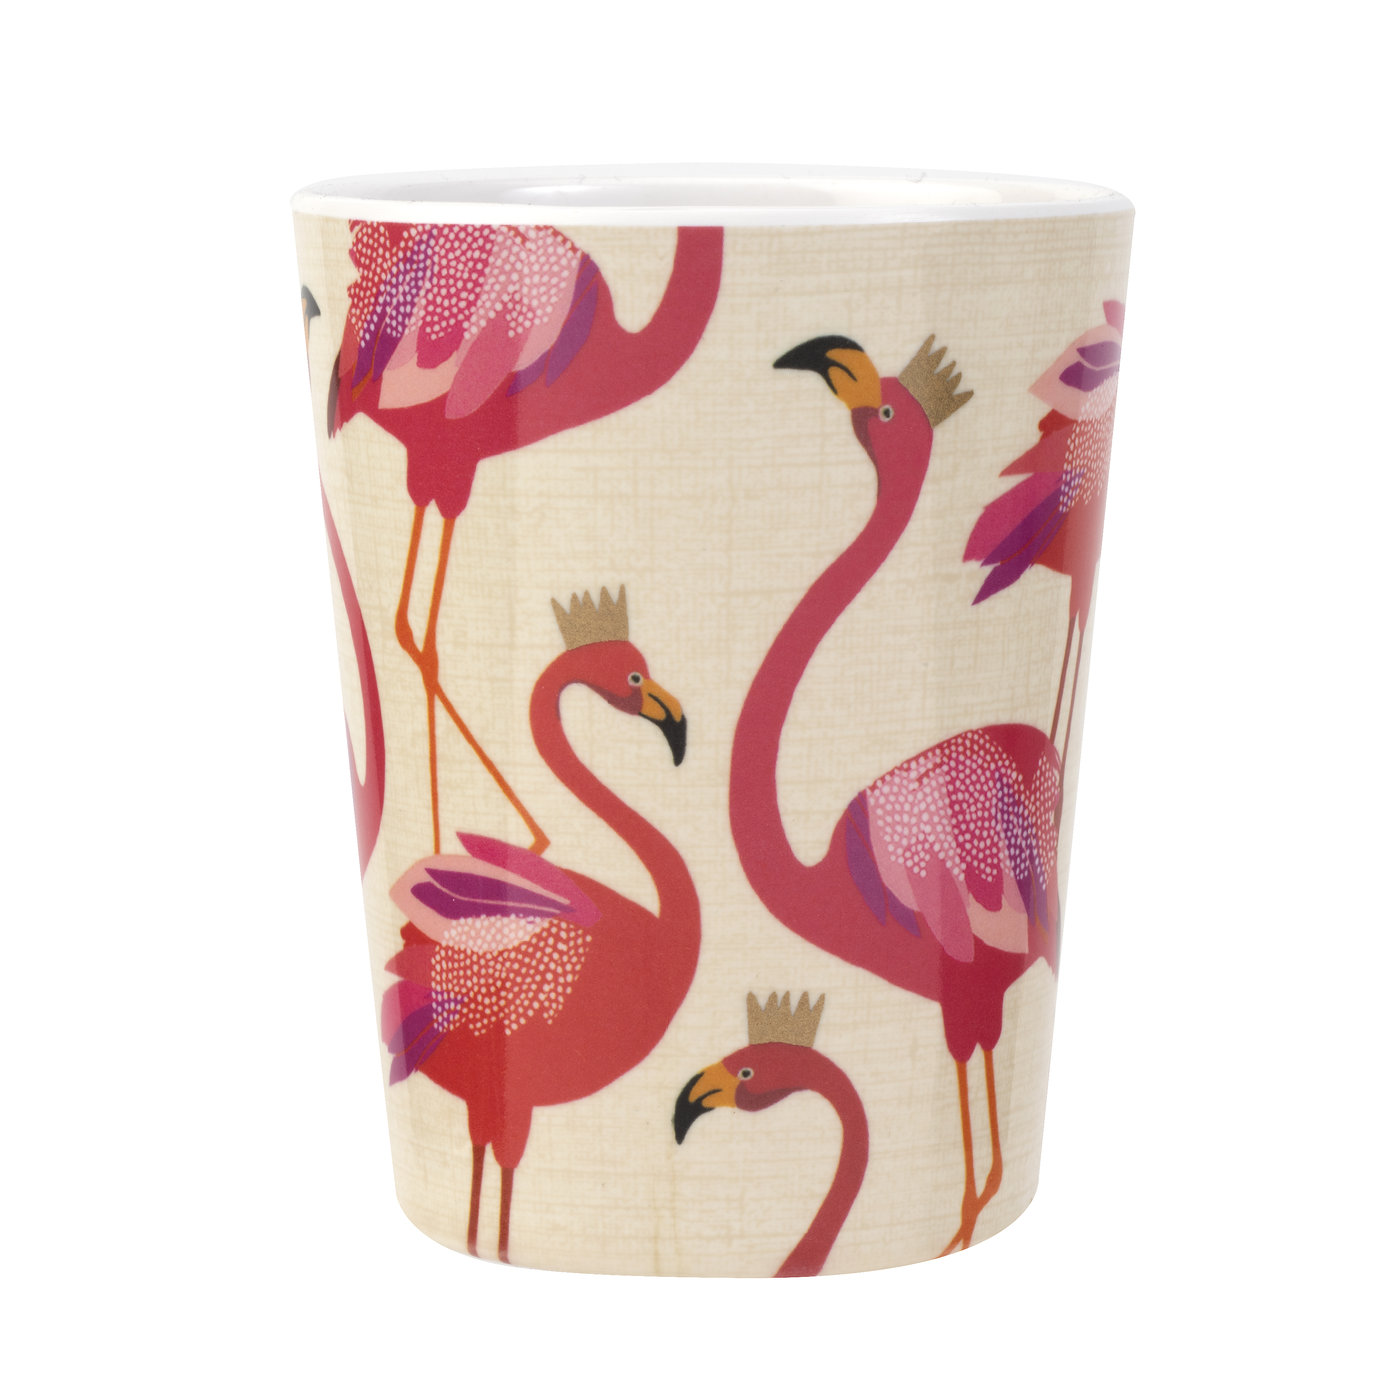 Sara Miller London Portmeirion Flamingo Melamine Cup